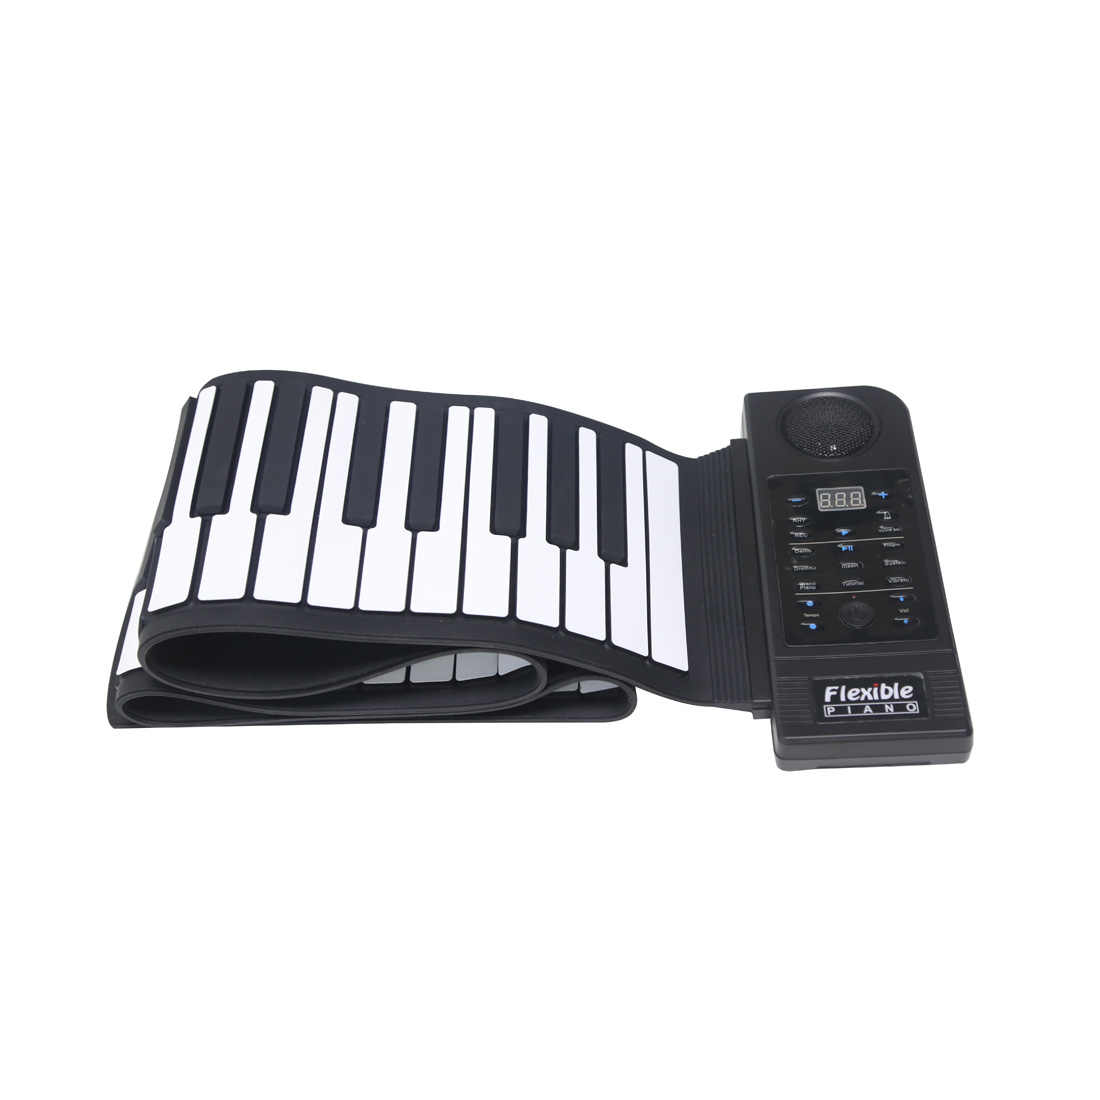 KONIX PU88M 88 Keys Black MIDI 128 Tones Electronic Organ Roll Up Folding  Piano Built-in Speaker for Kids